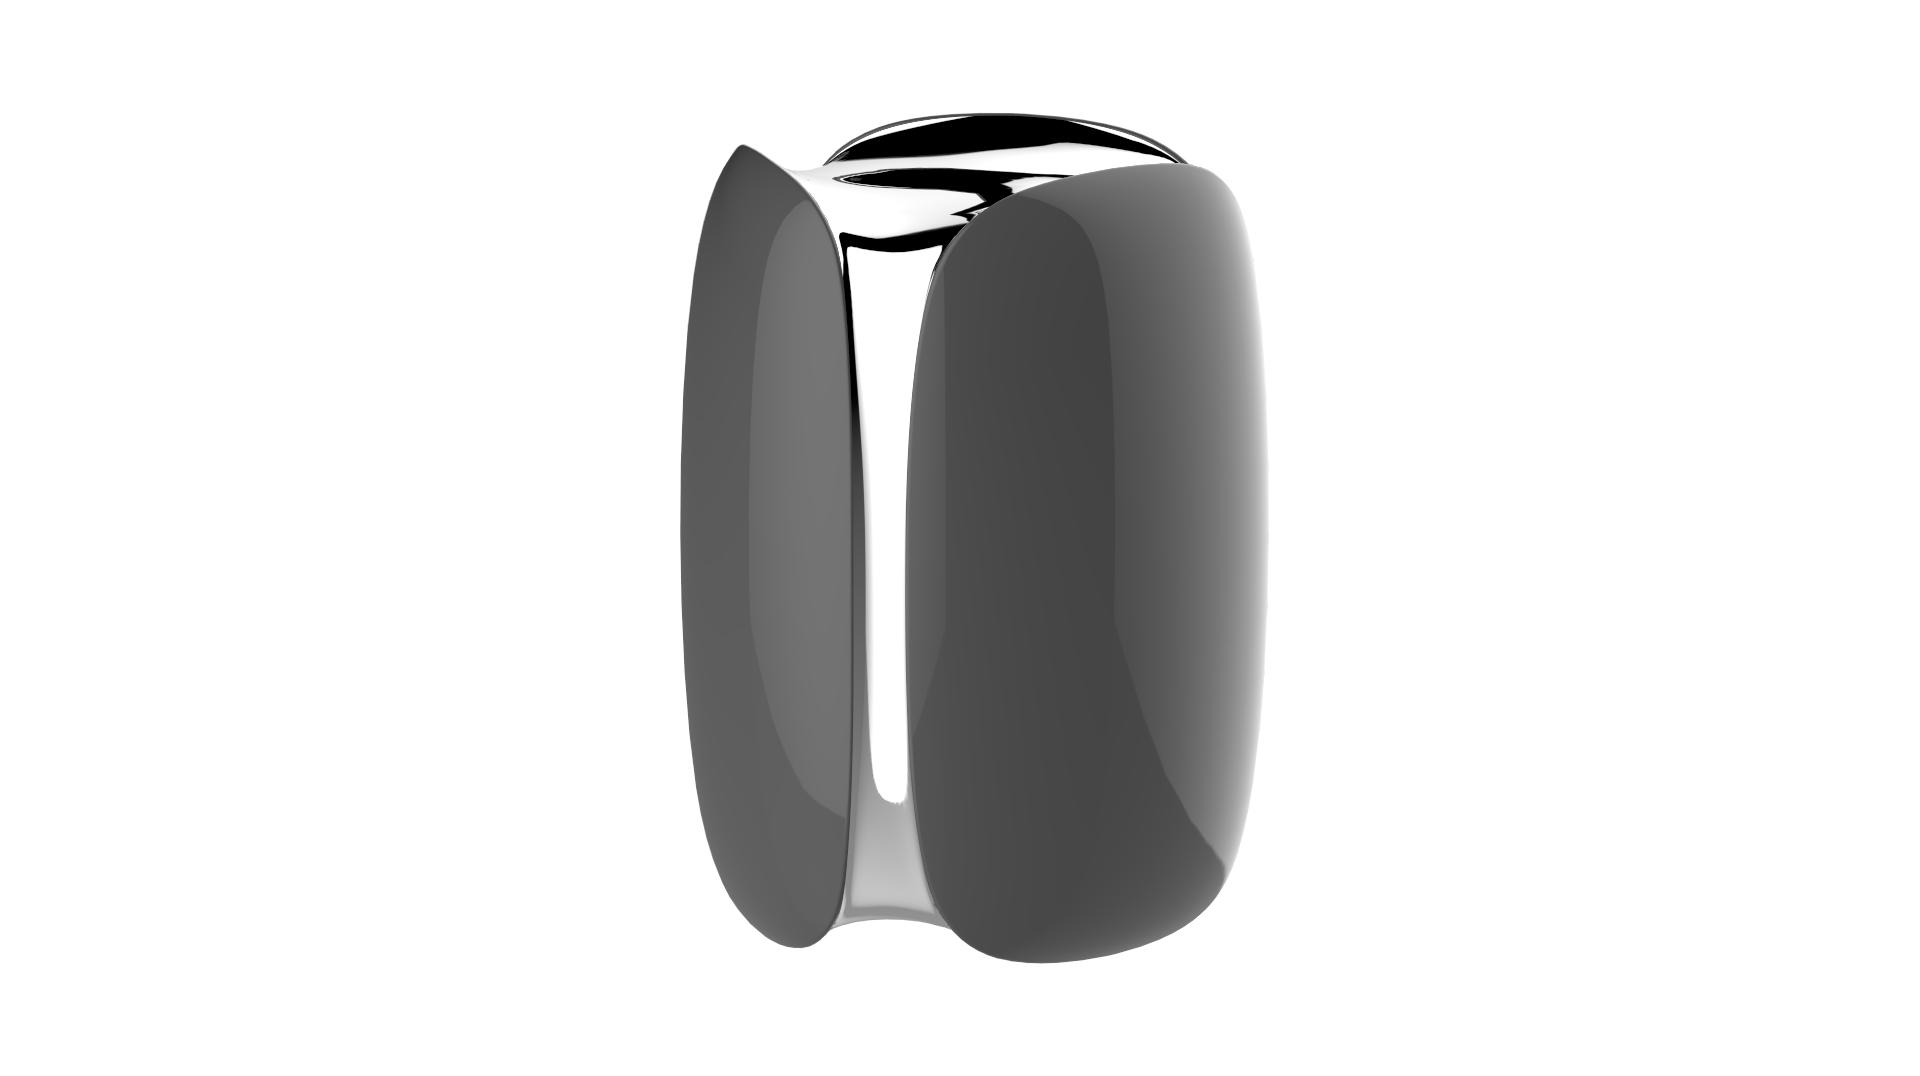 f103.460